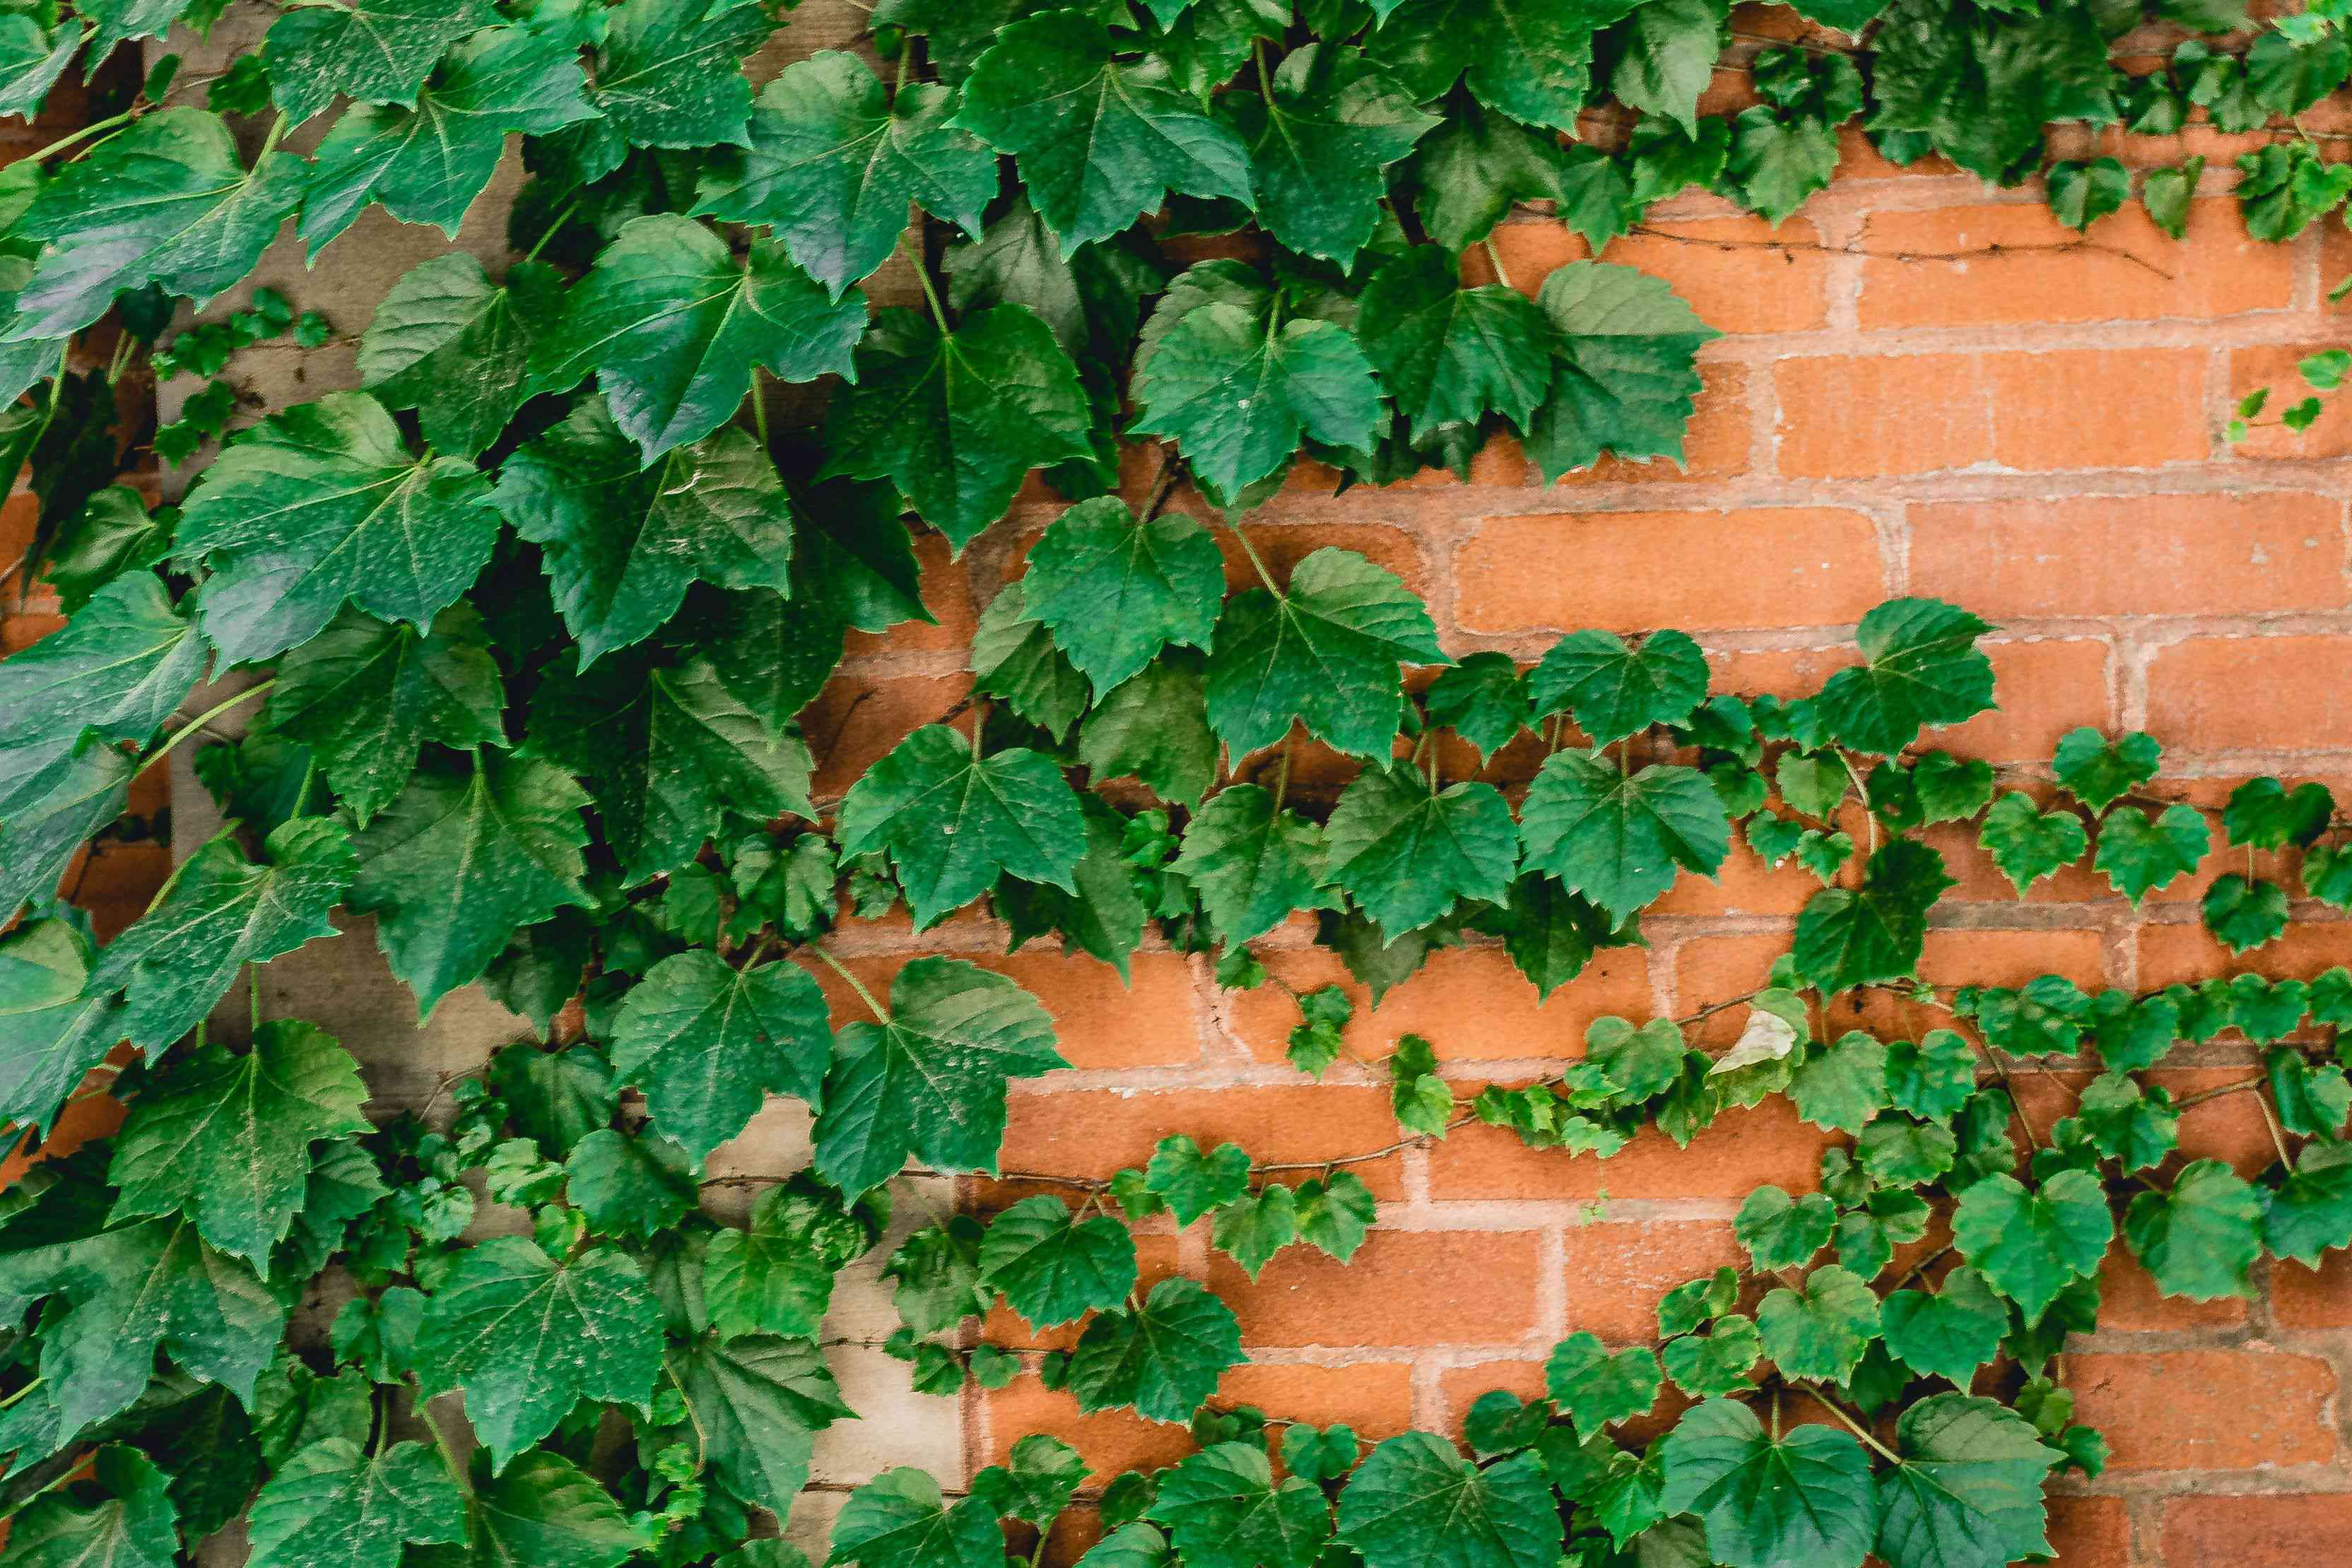 Boston ivy vine with dark-green leaves climbing brick wall